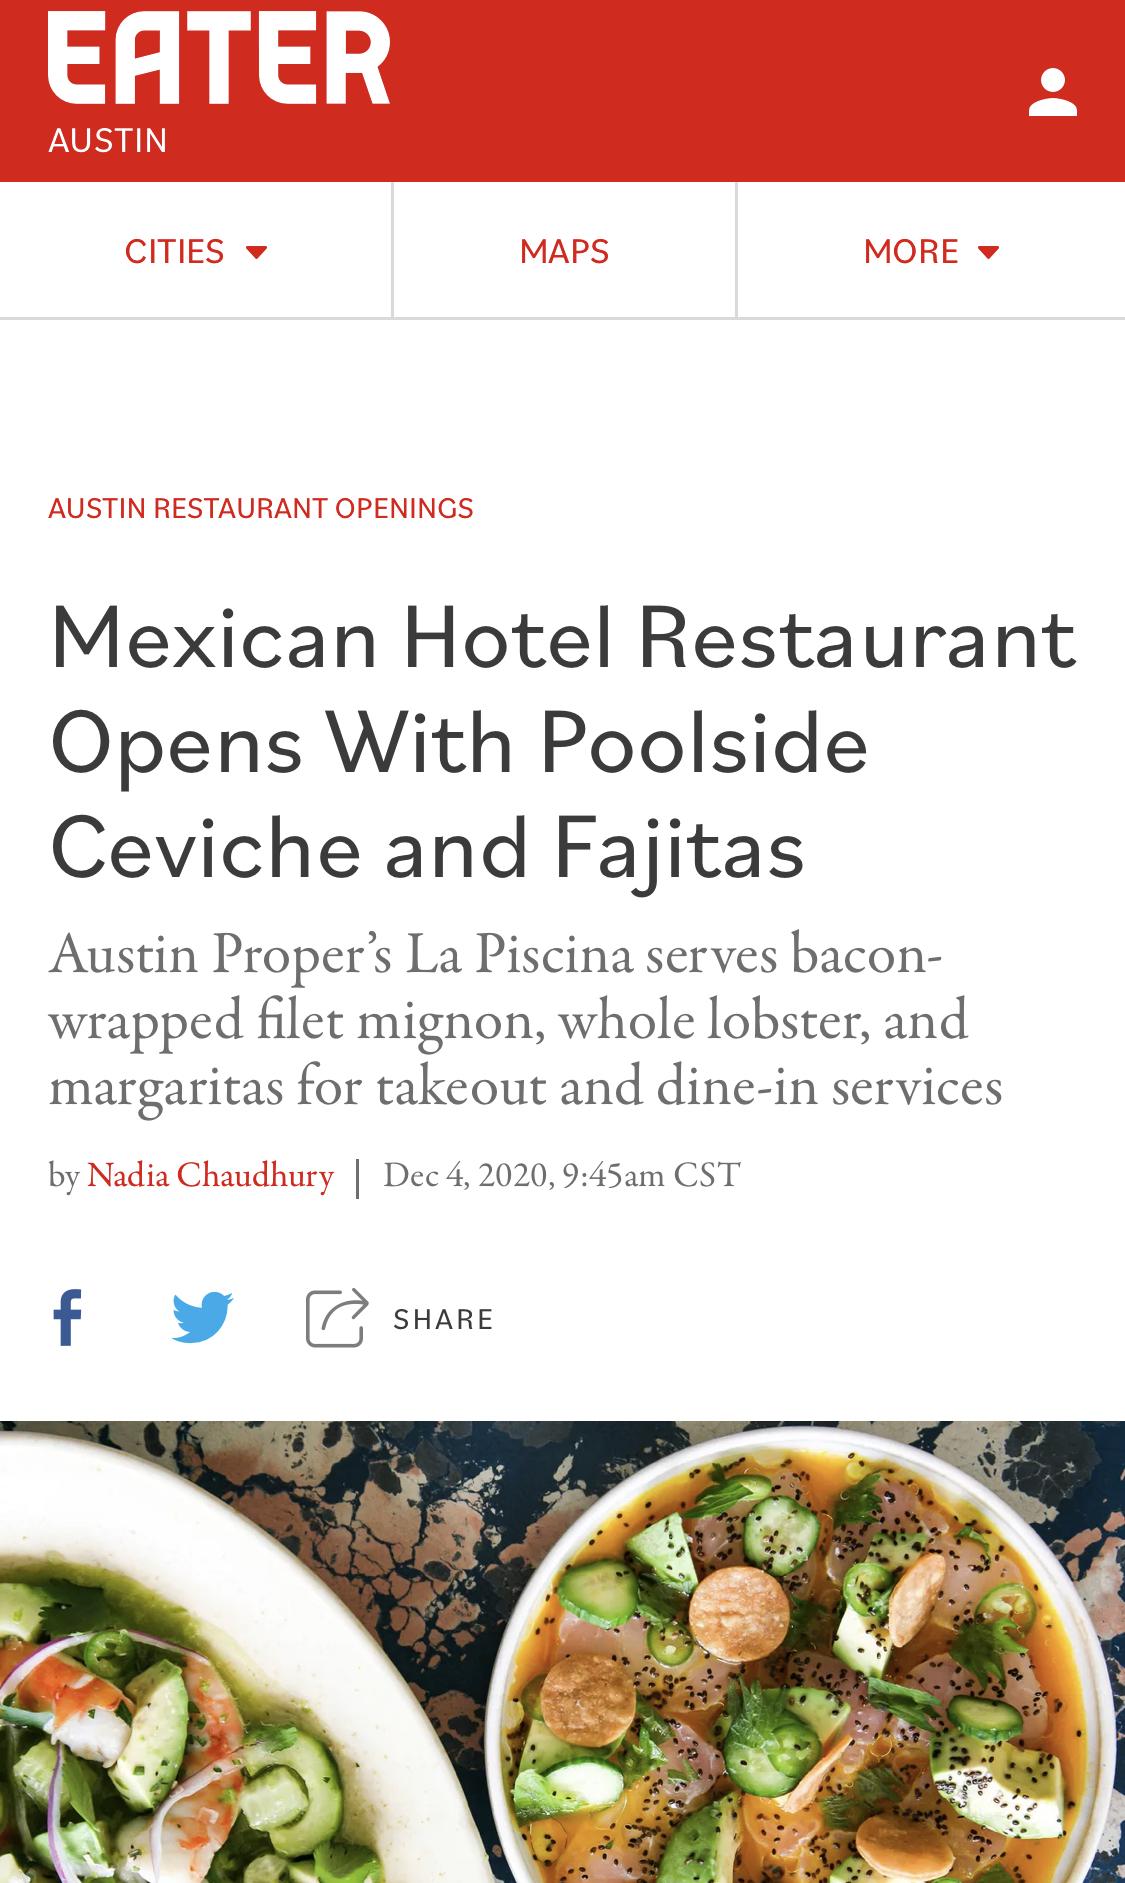 Austin Proper Hotel Image